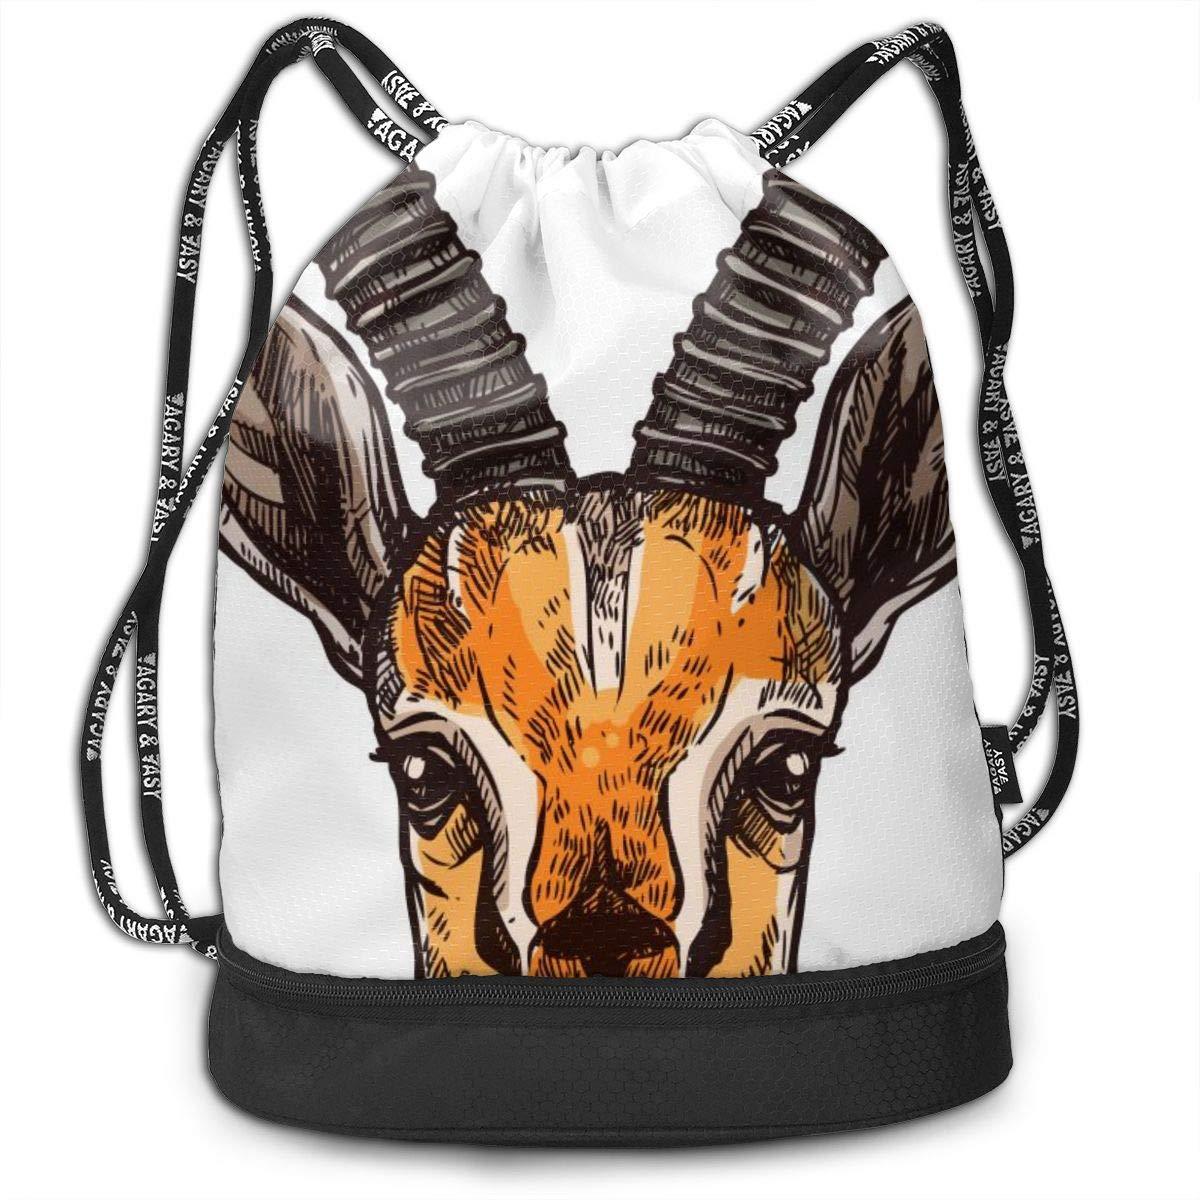 Lightweight Waterproof Large Storage Drawstring Bag For Men /& Women African Antelopes Cinch Backpack Sackpack Tote Sack